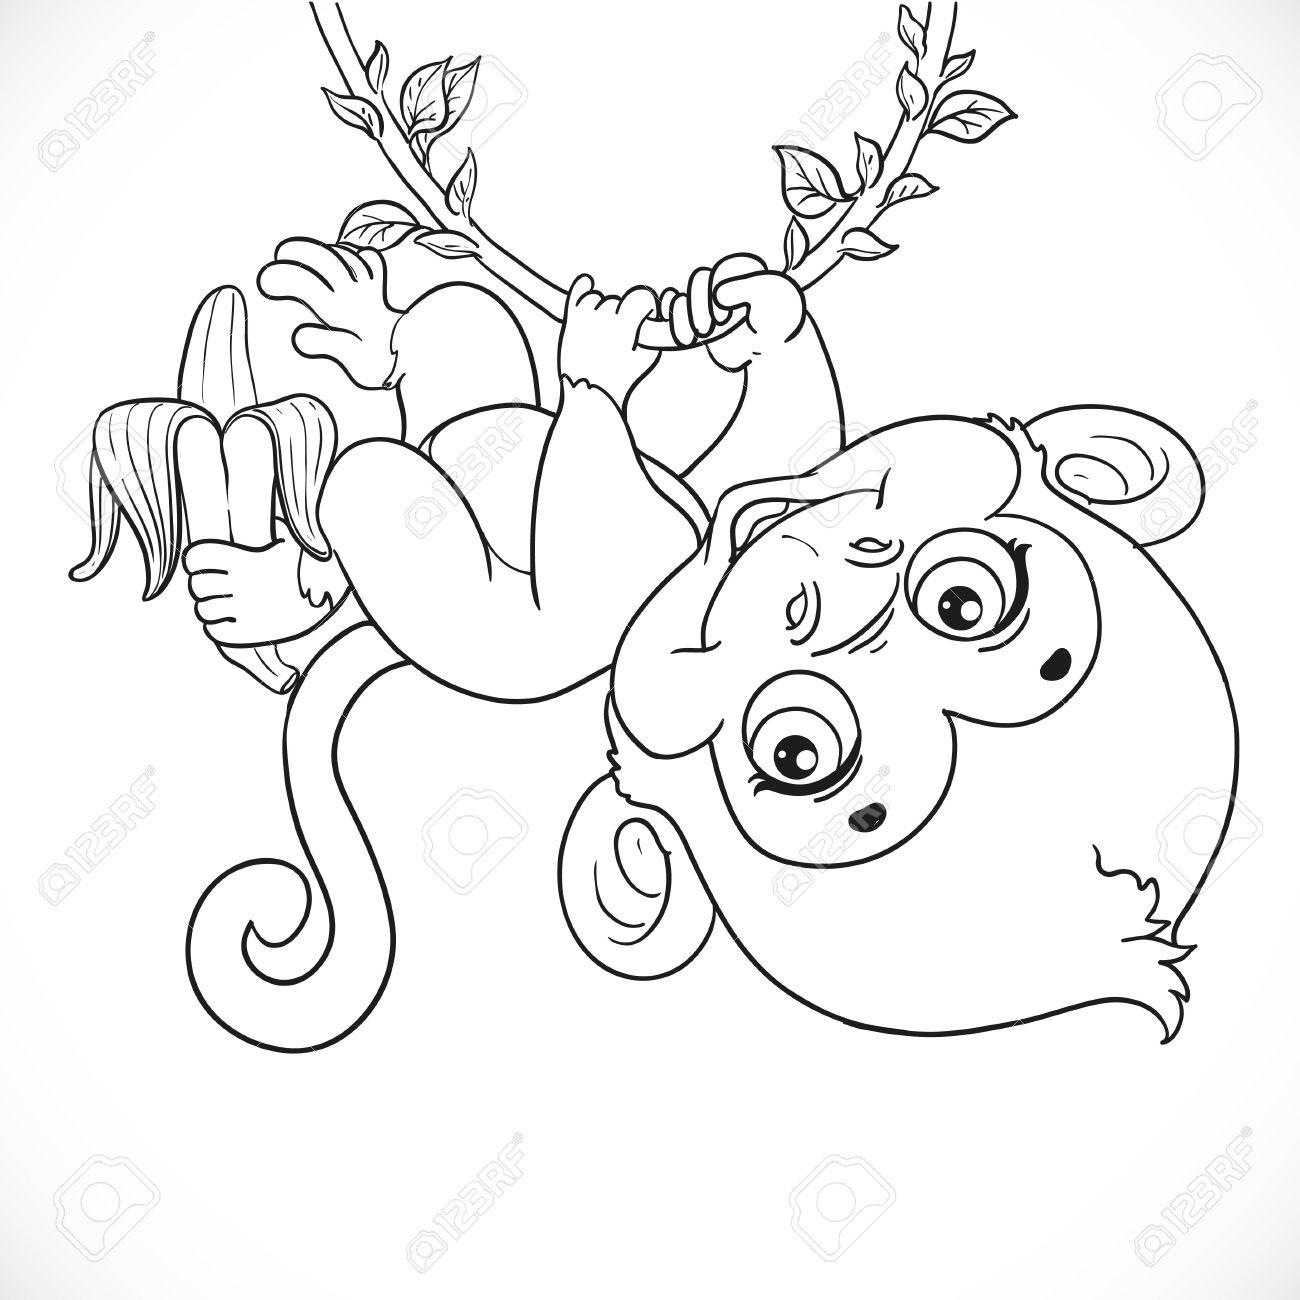 1300x1300 Cute Baby Monkey Drawings